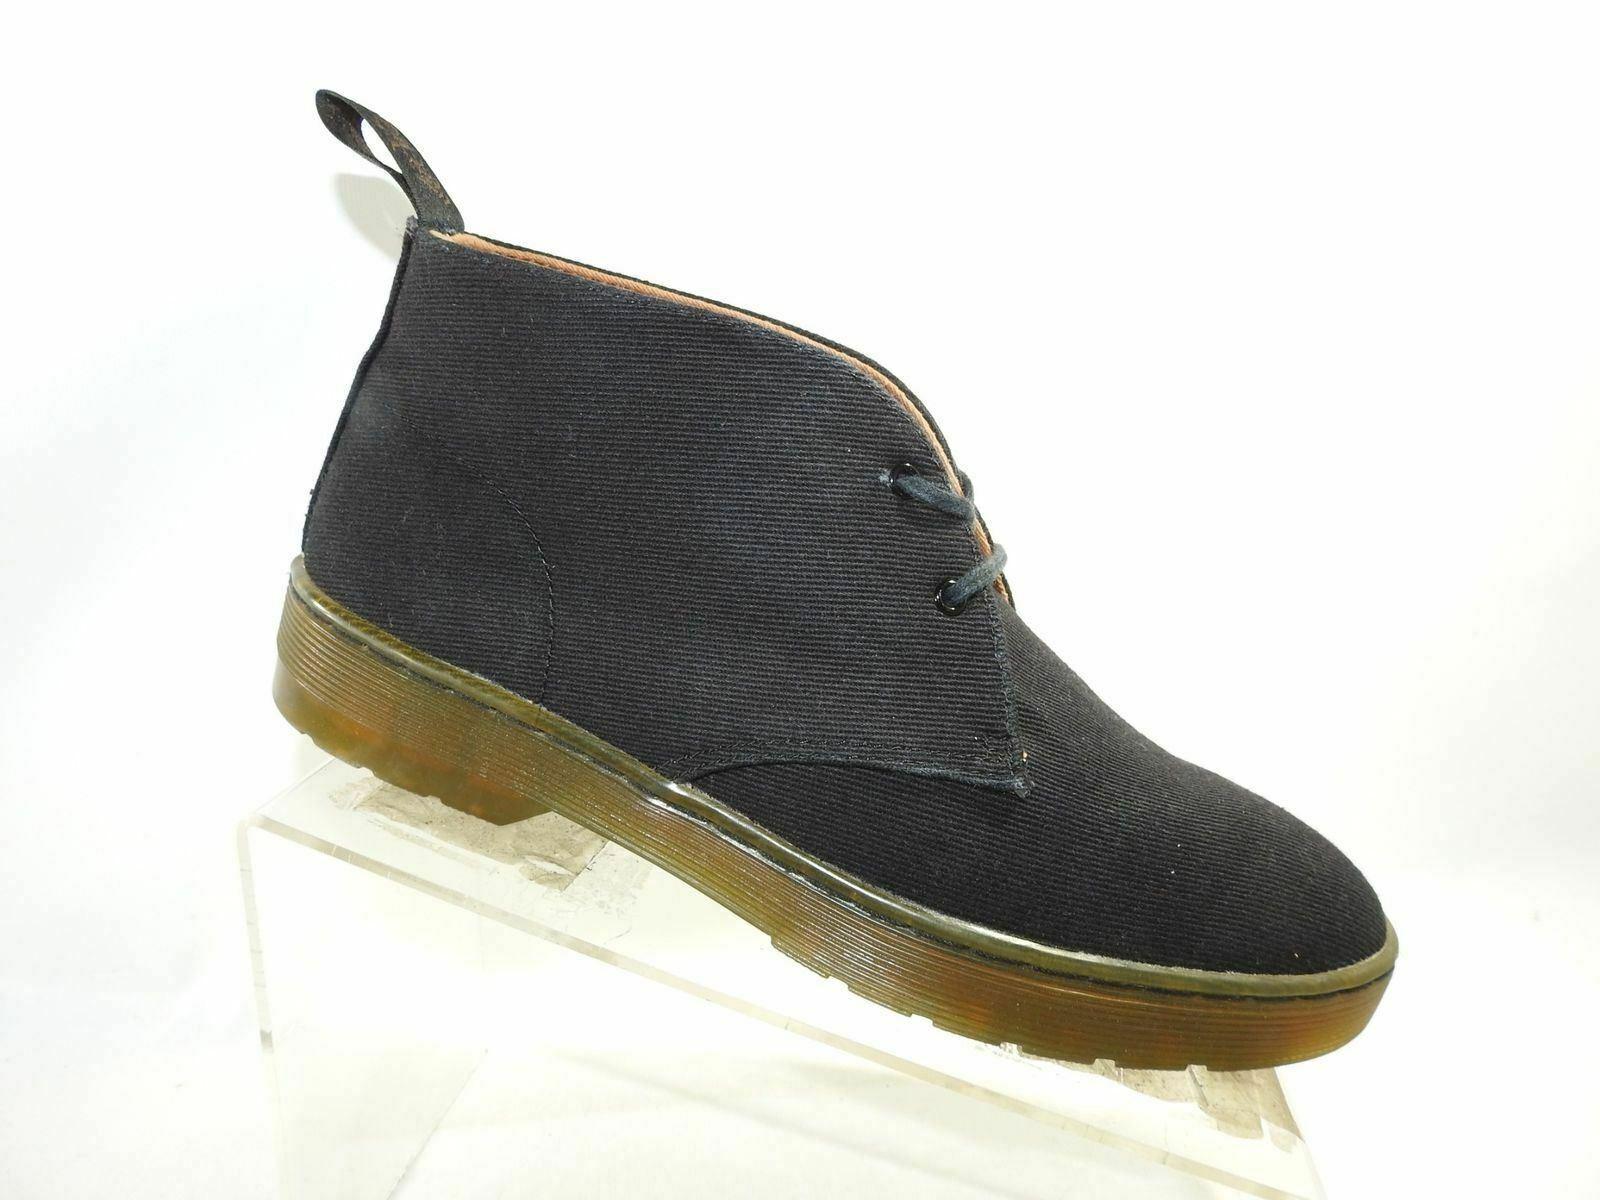 Dr. Martens DAYTONA AW004 Sz 9 M azul Desert Chukka Ankle botas zapatos For mujer